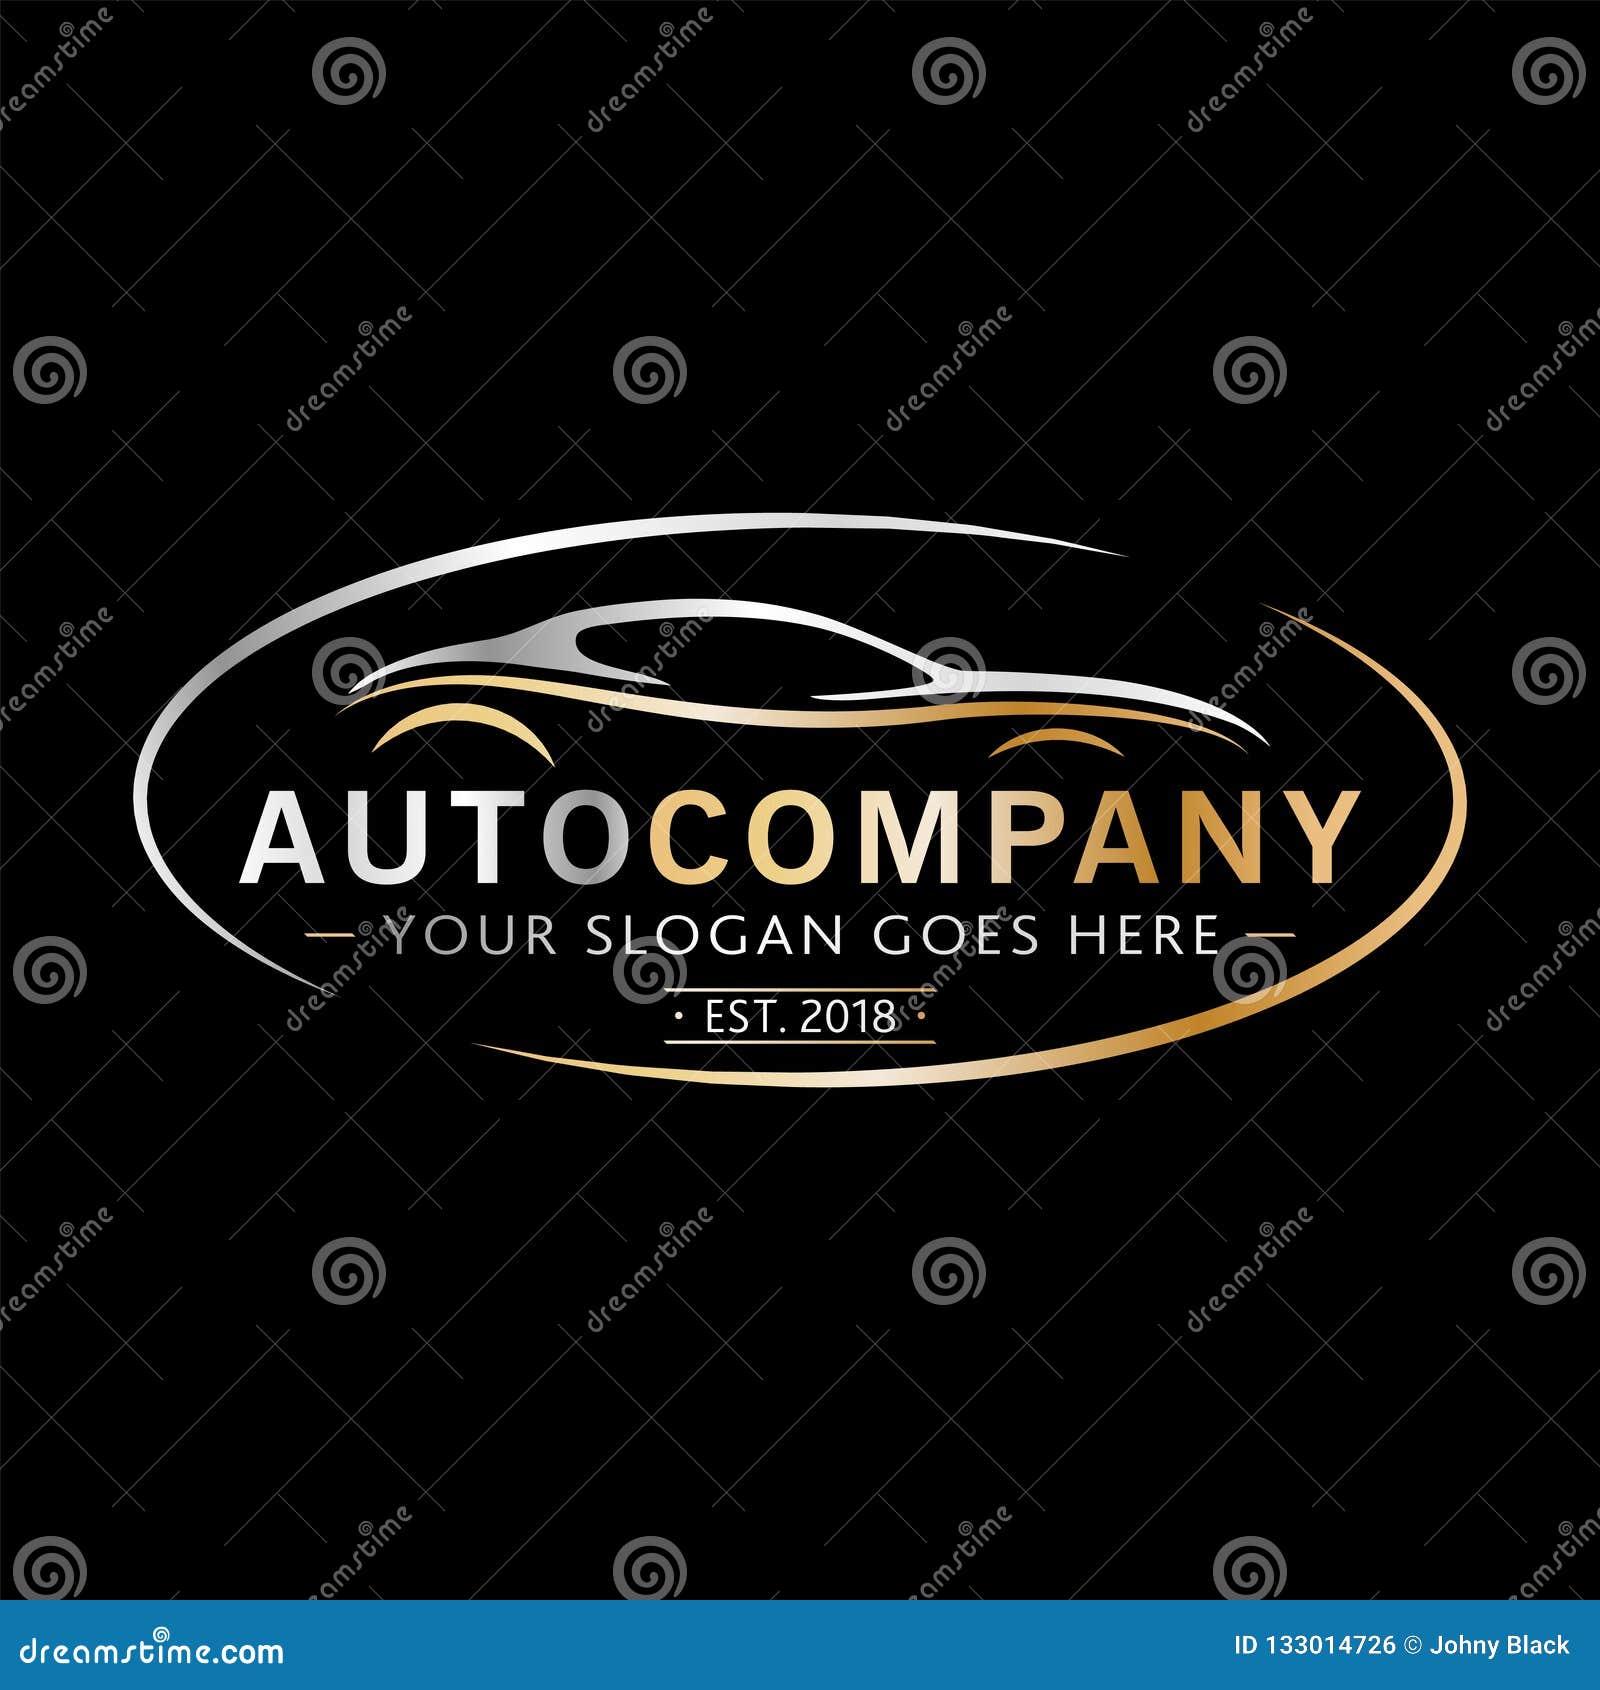 Modern Auto Company Logo Design Vector And Illustration Stock Vector Illustration Of Corporate Line 133014726